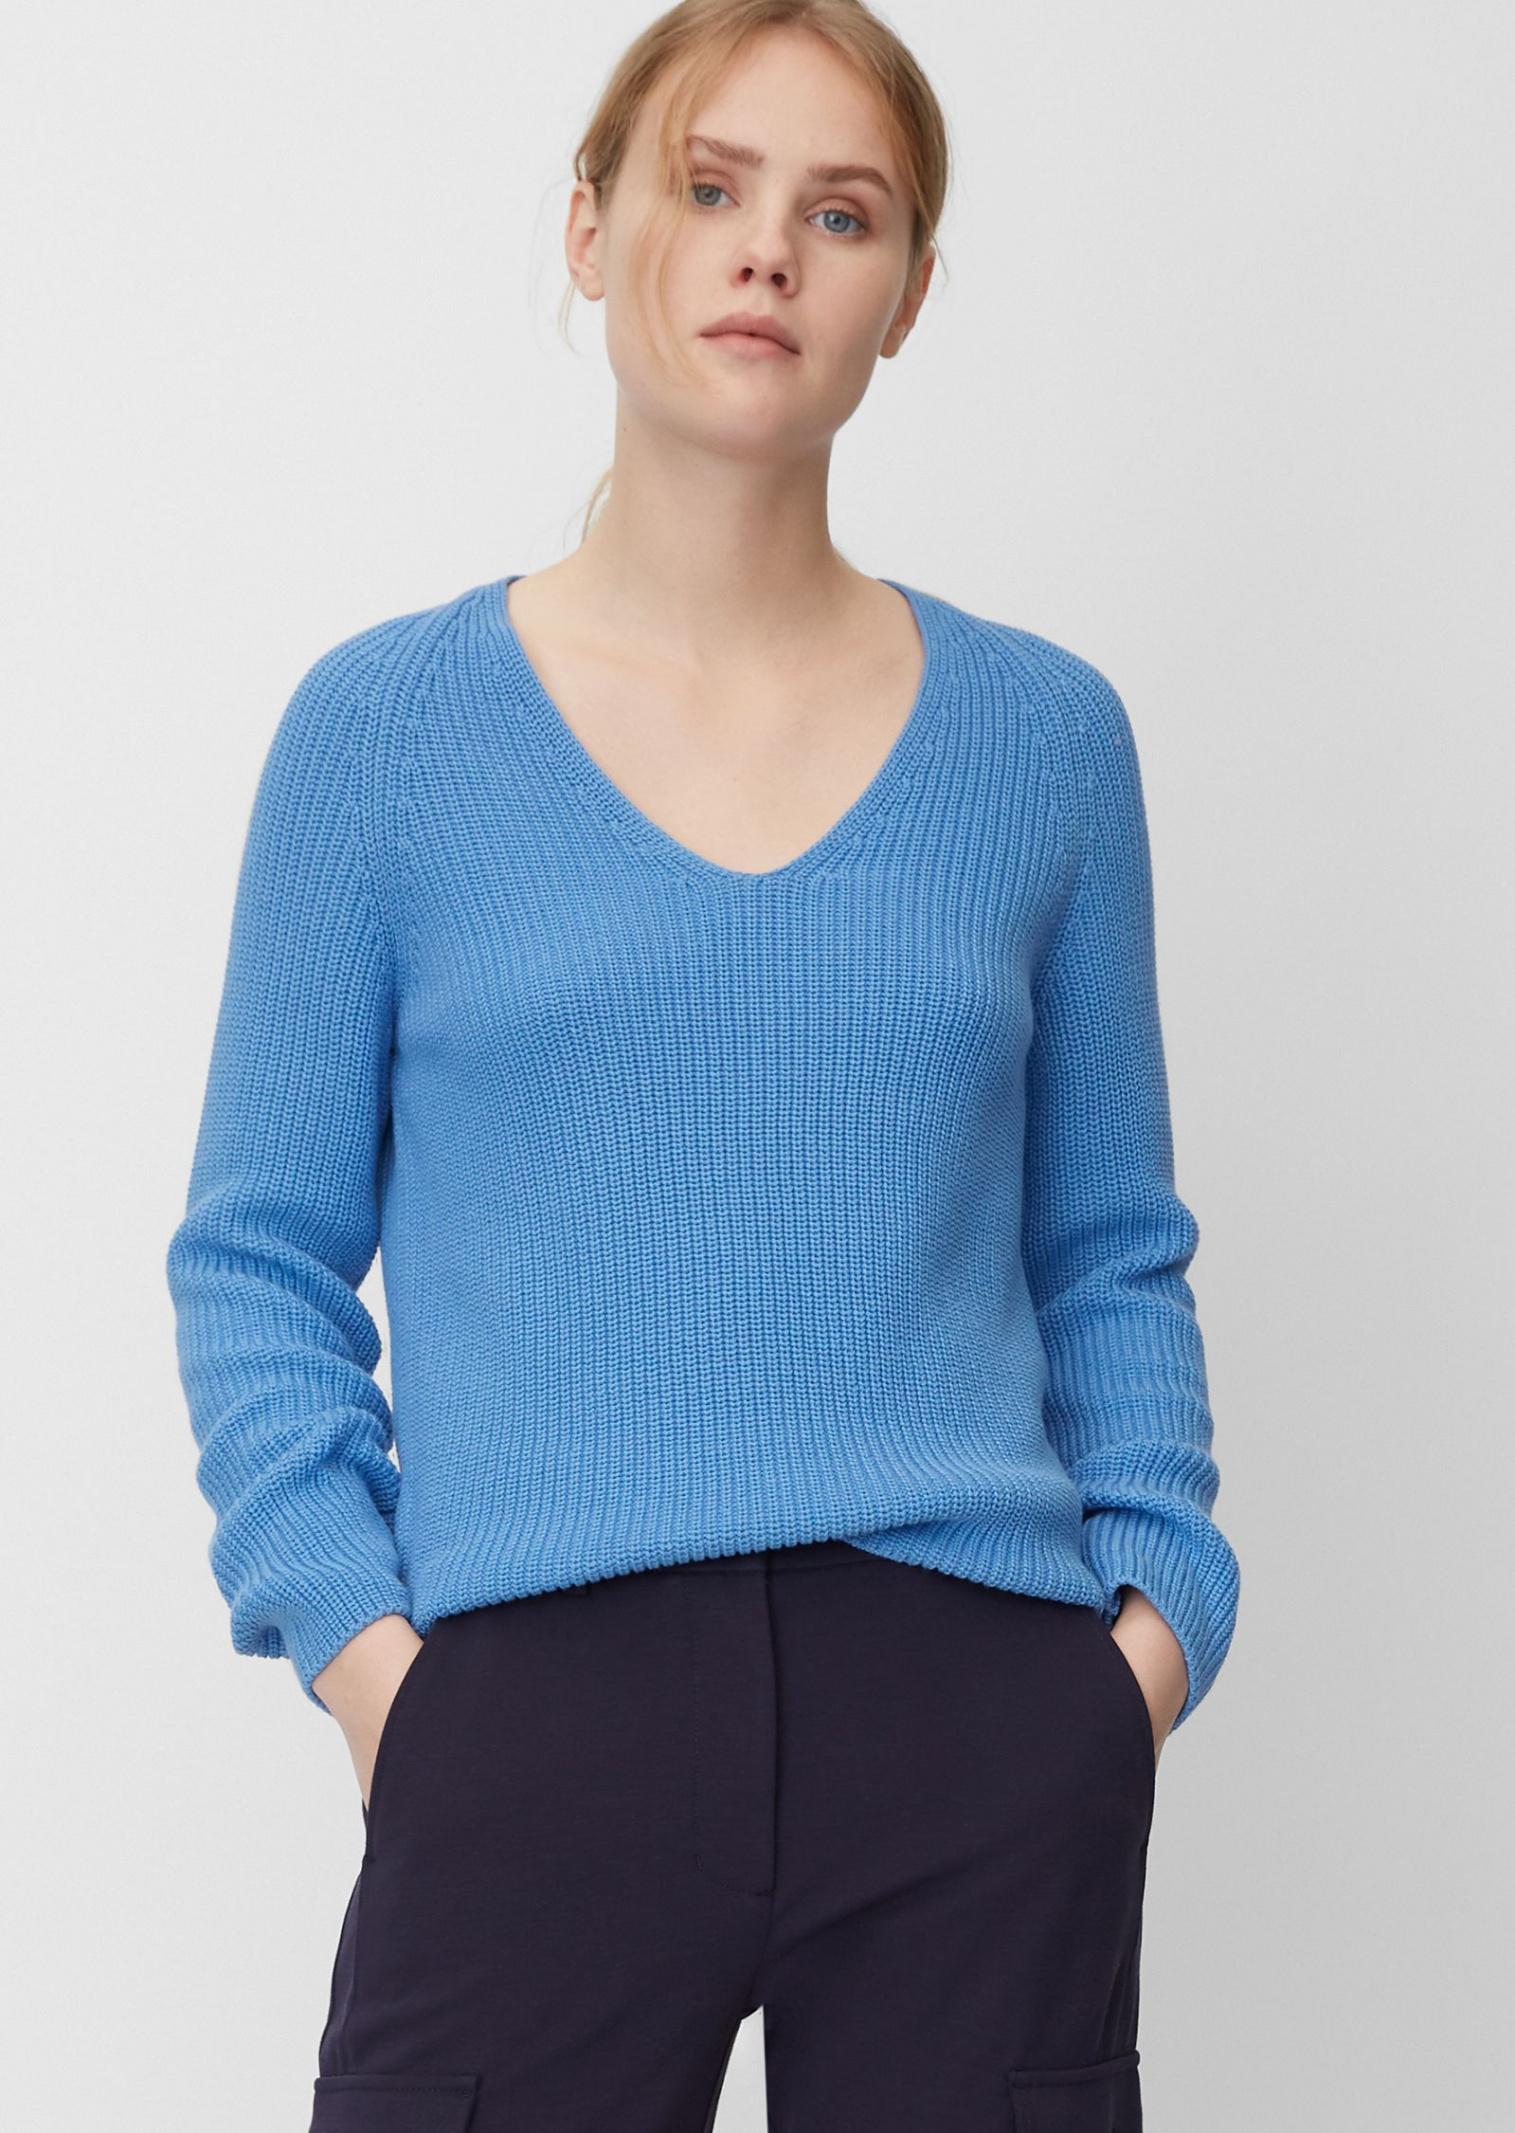 Кофты и свитера женские MARC O'POLO модель PF3981 характеристики, 2017